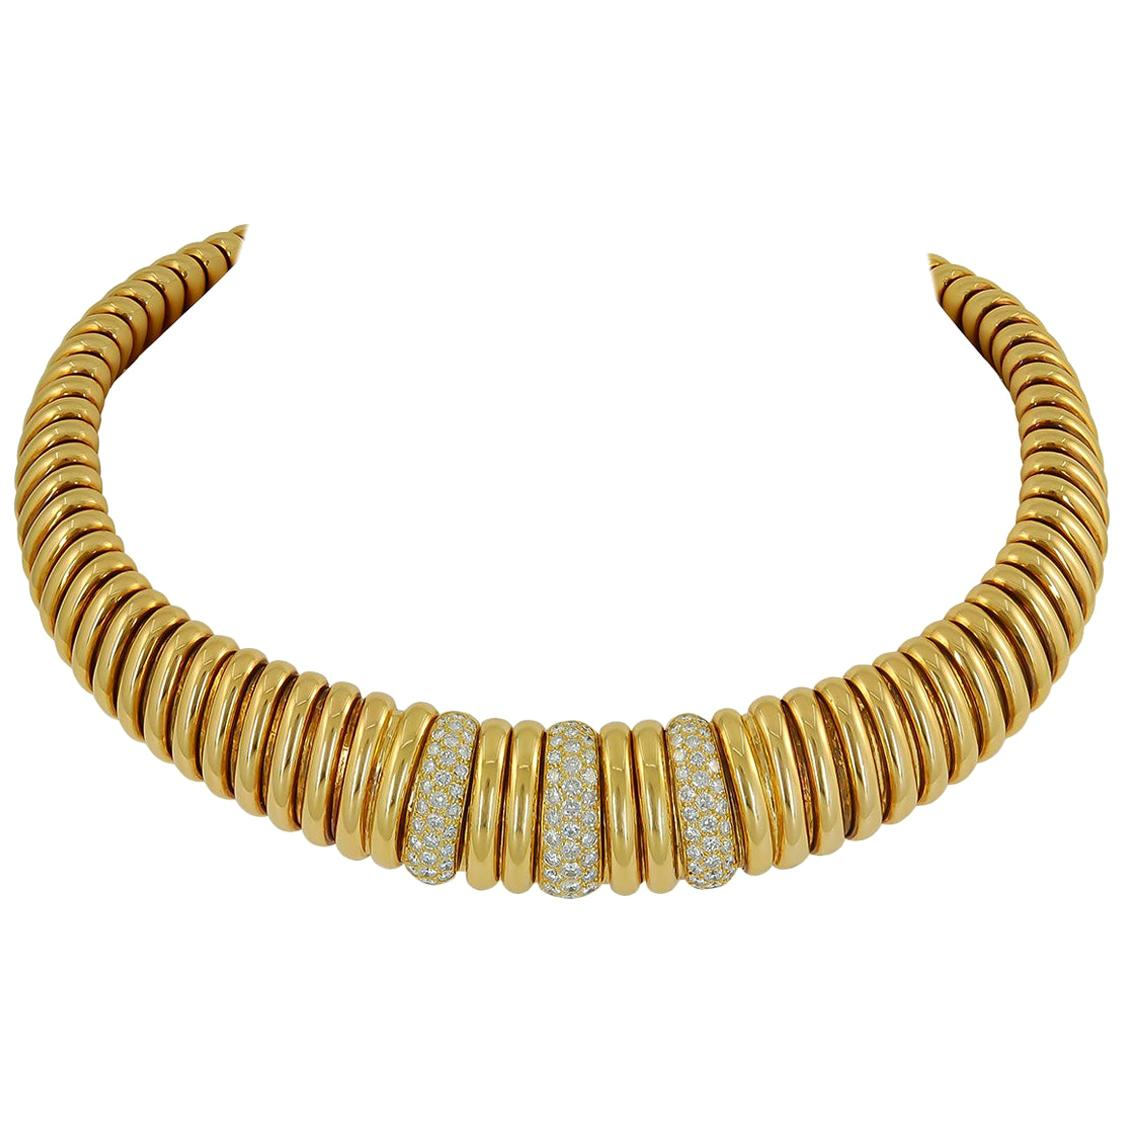 Van Cleef & Arpels Diamond Choker Necklace